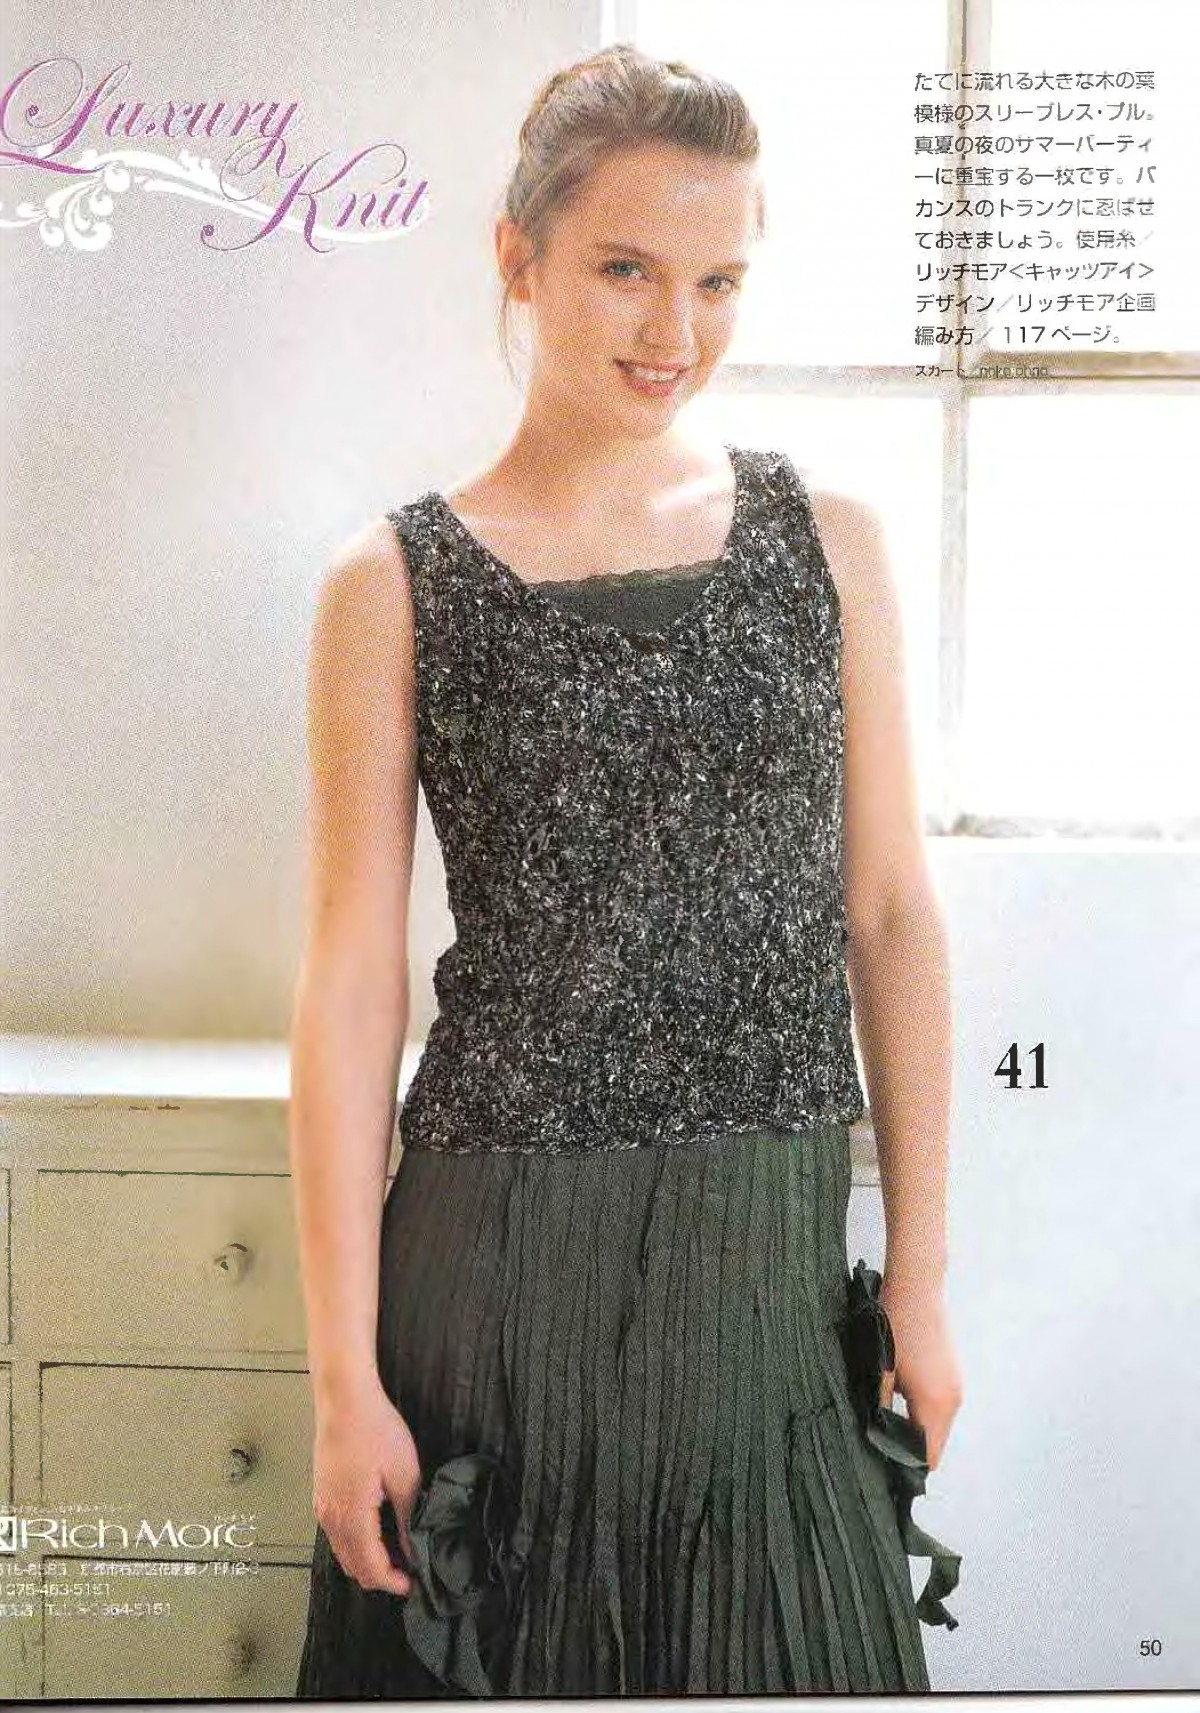 Lets-knit-series-NV4359-2008-Spring-Summer-sp-kr_48.jpg